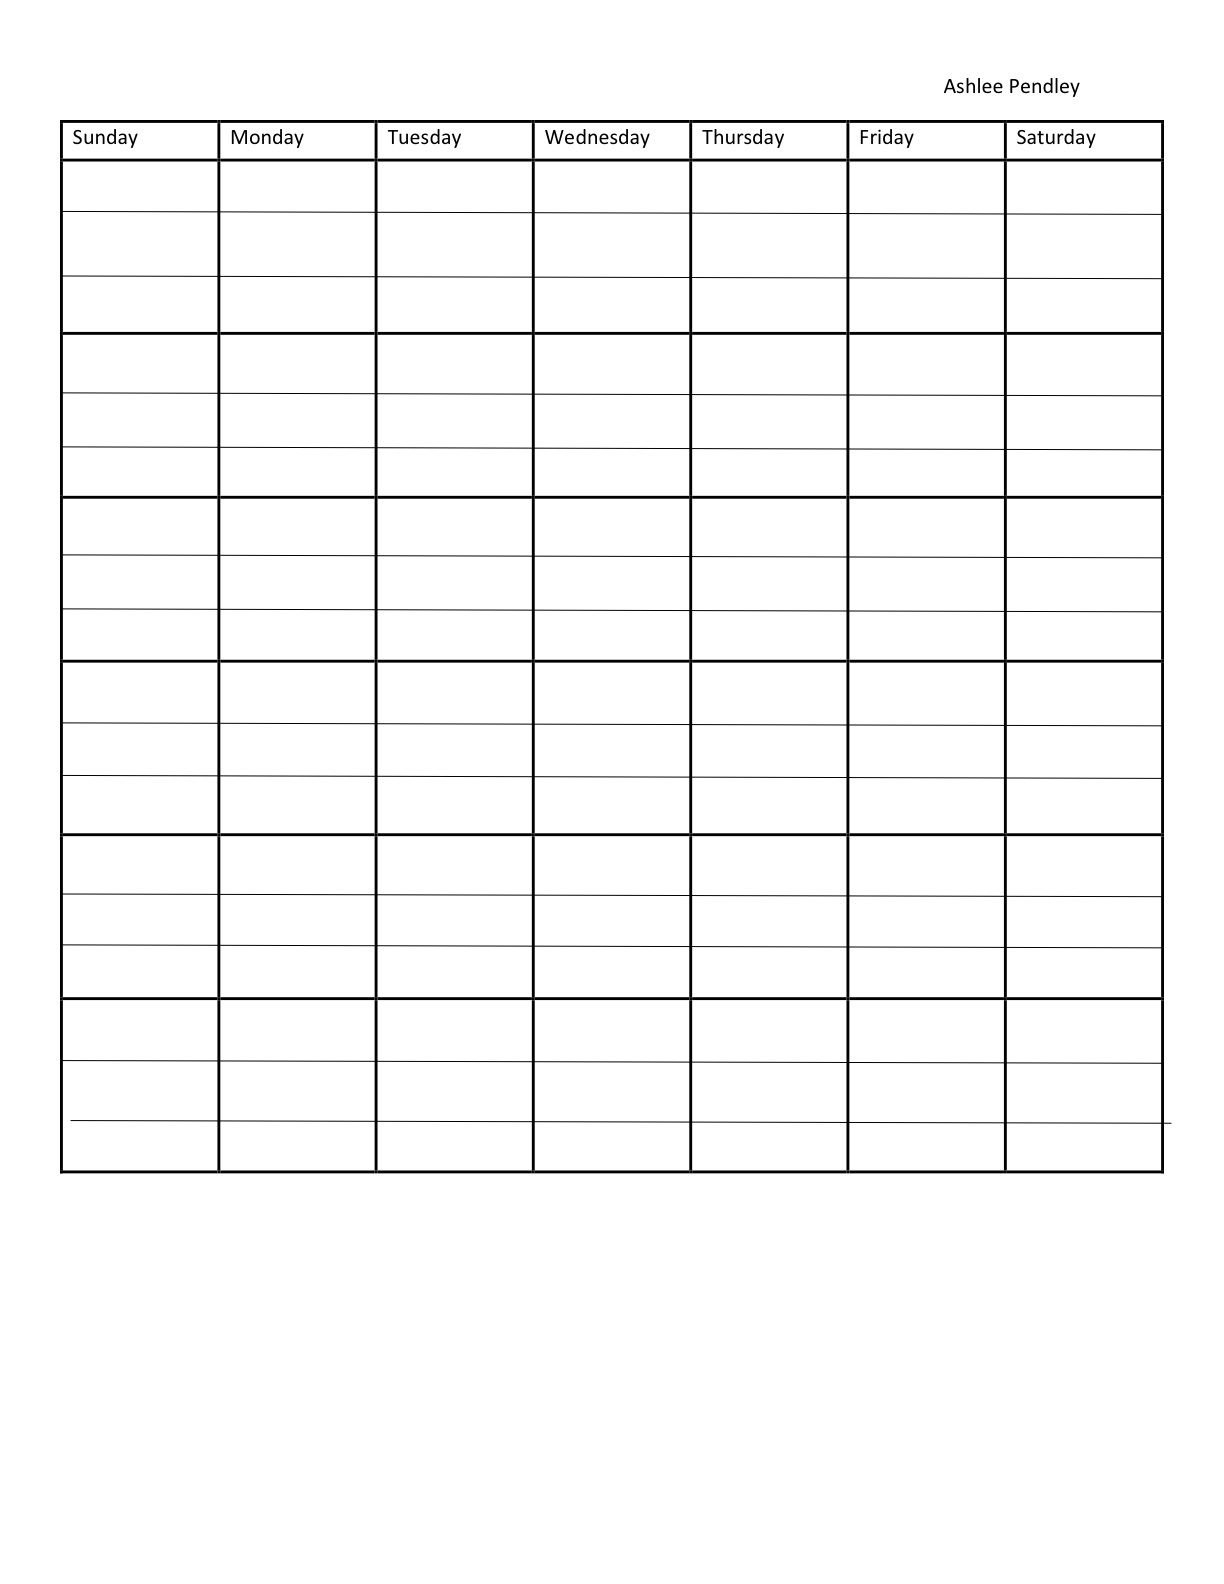 Blank Seven Day Calendar | Calendar Template, Weekly 7 Day Week Blank Timetable